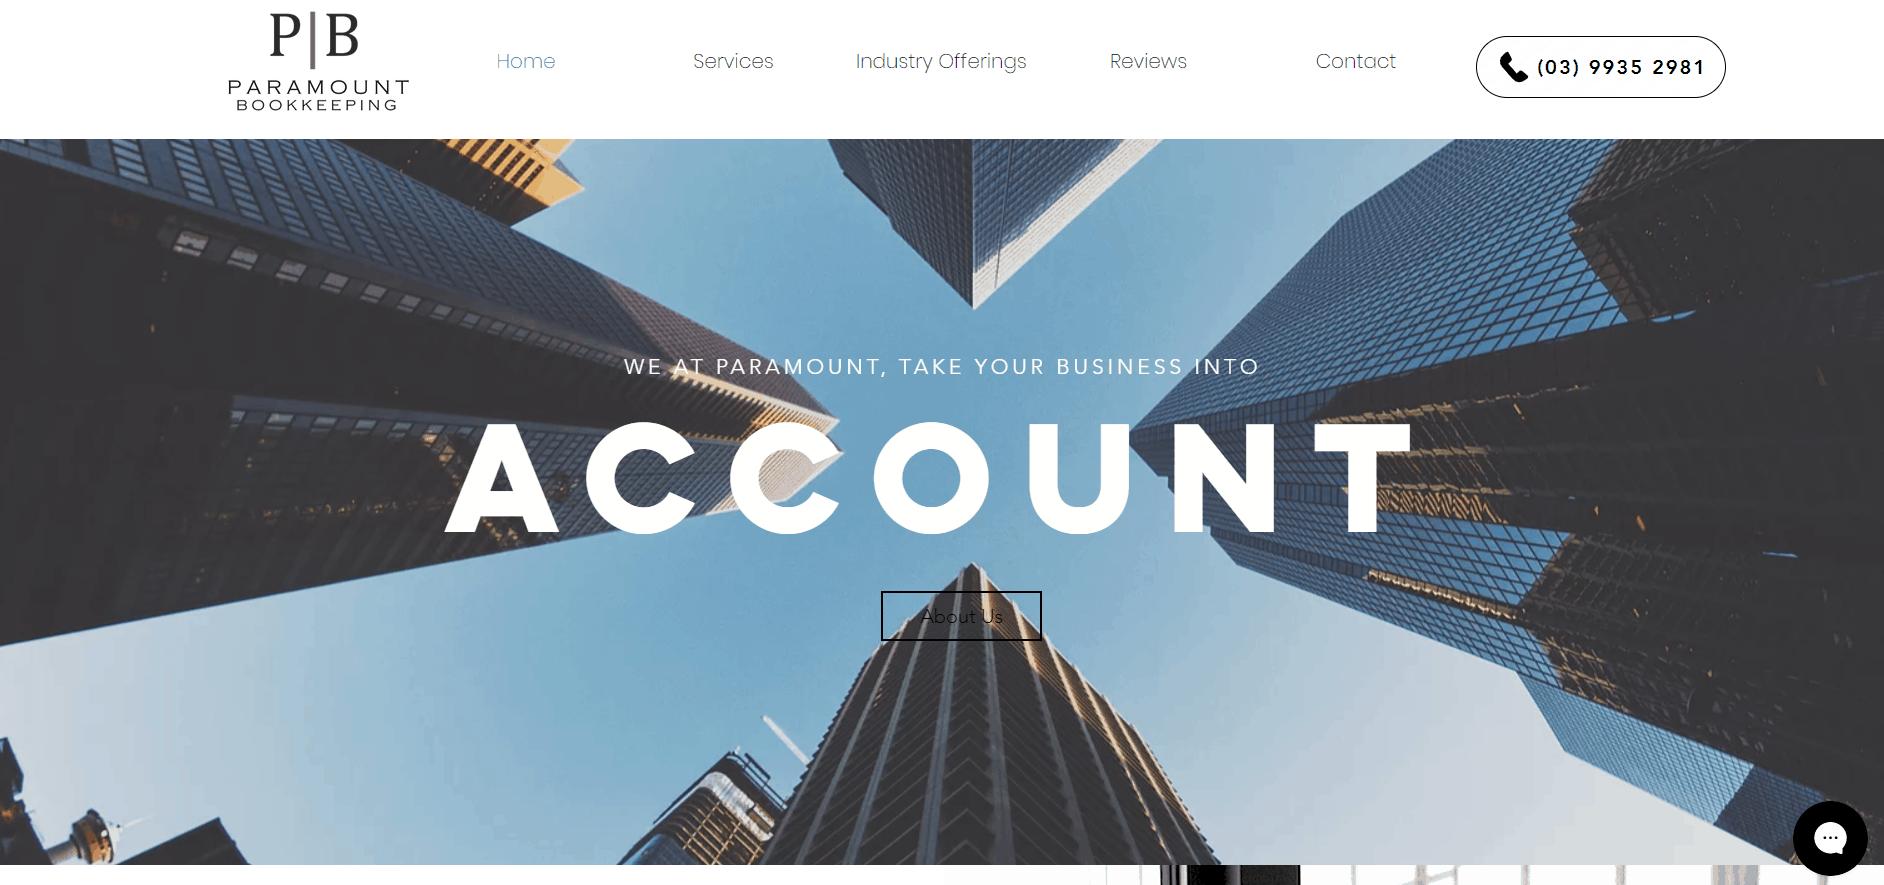 Paramount Bookkeeping